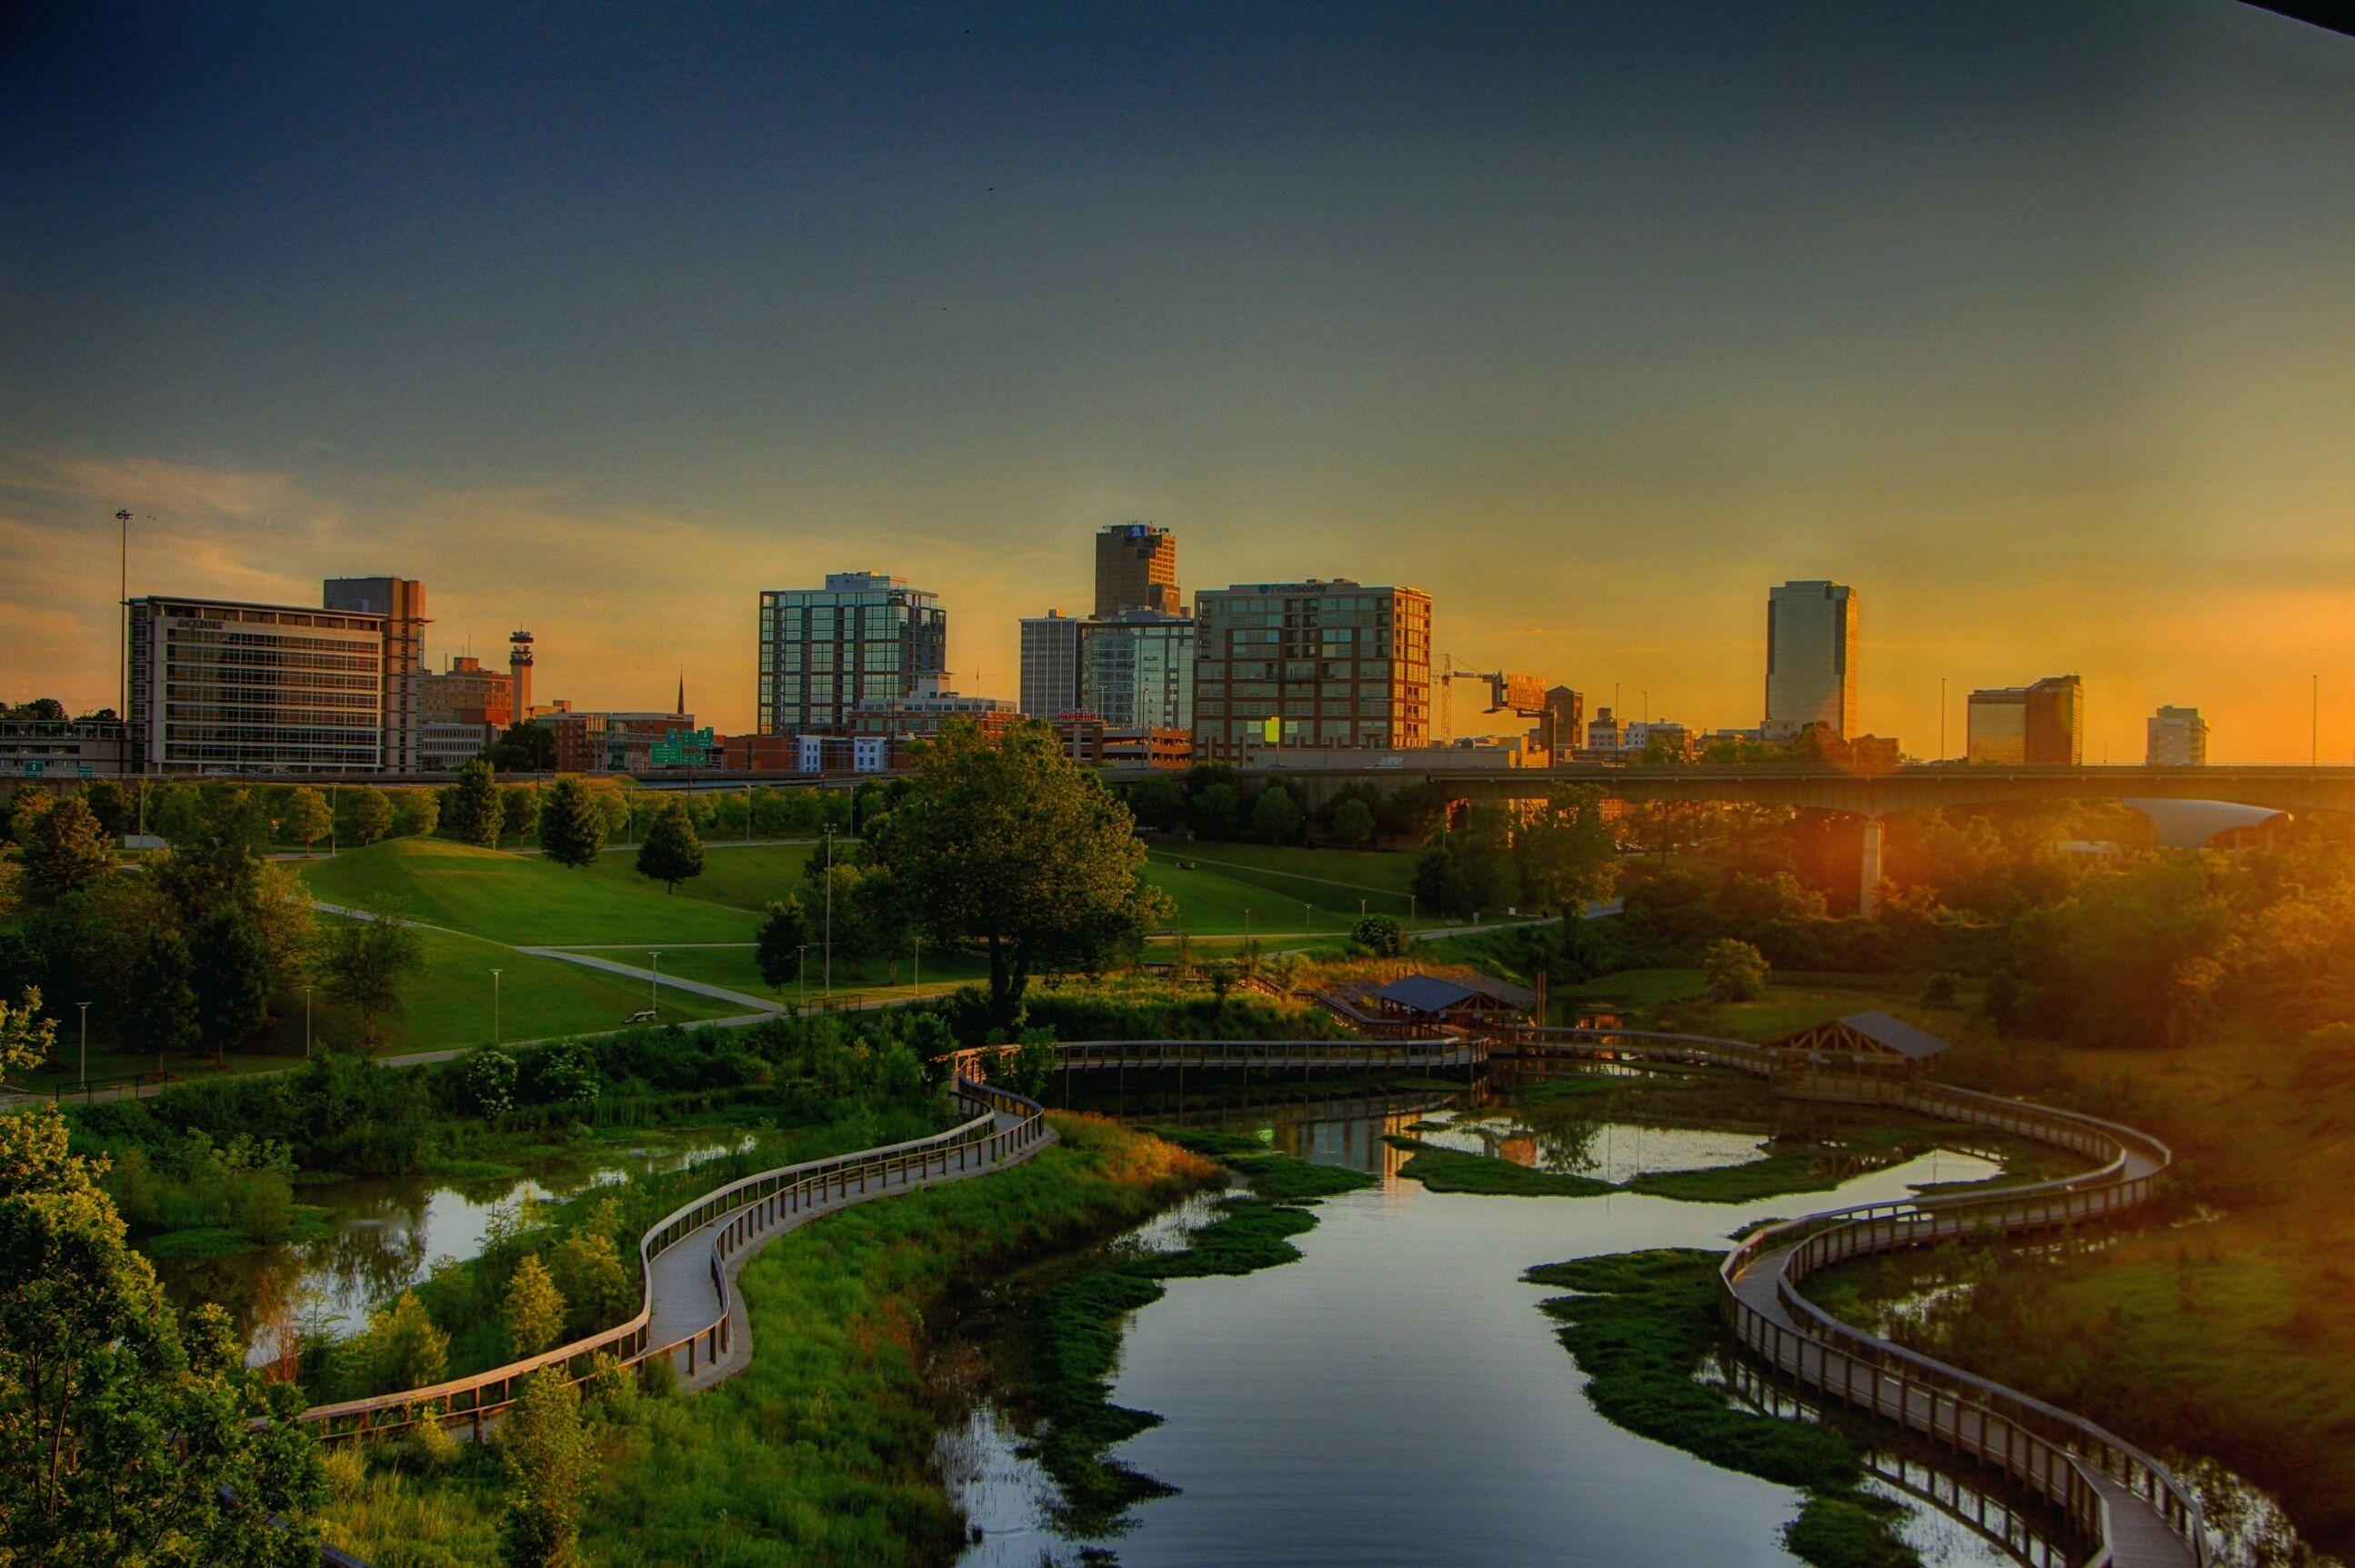 The Most Dangerous Areas in Little Rock, Arkansas